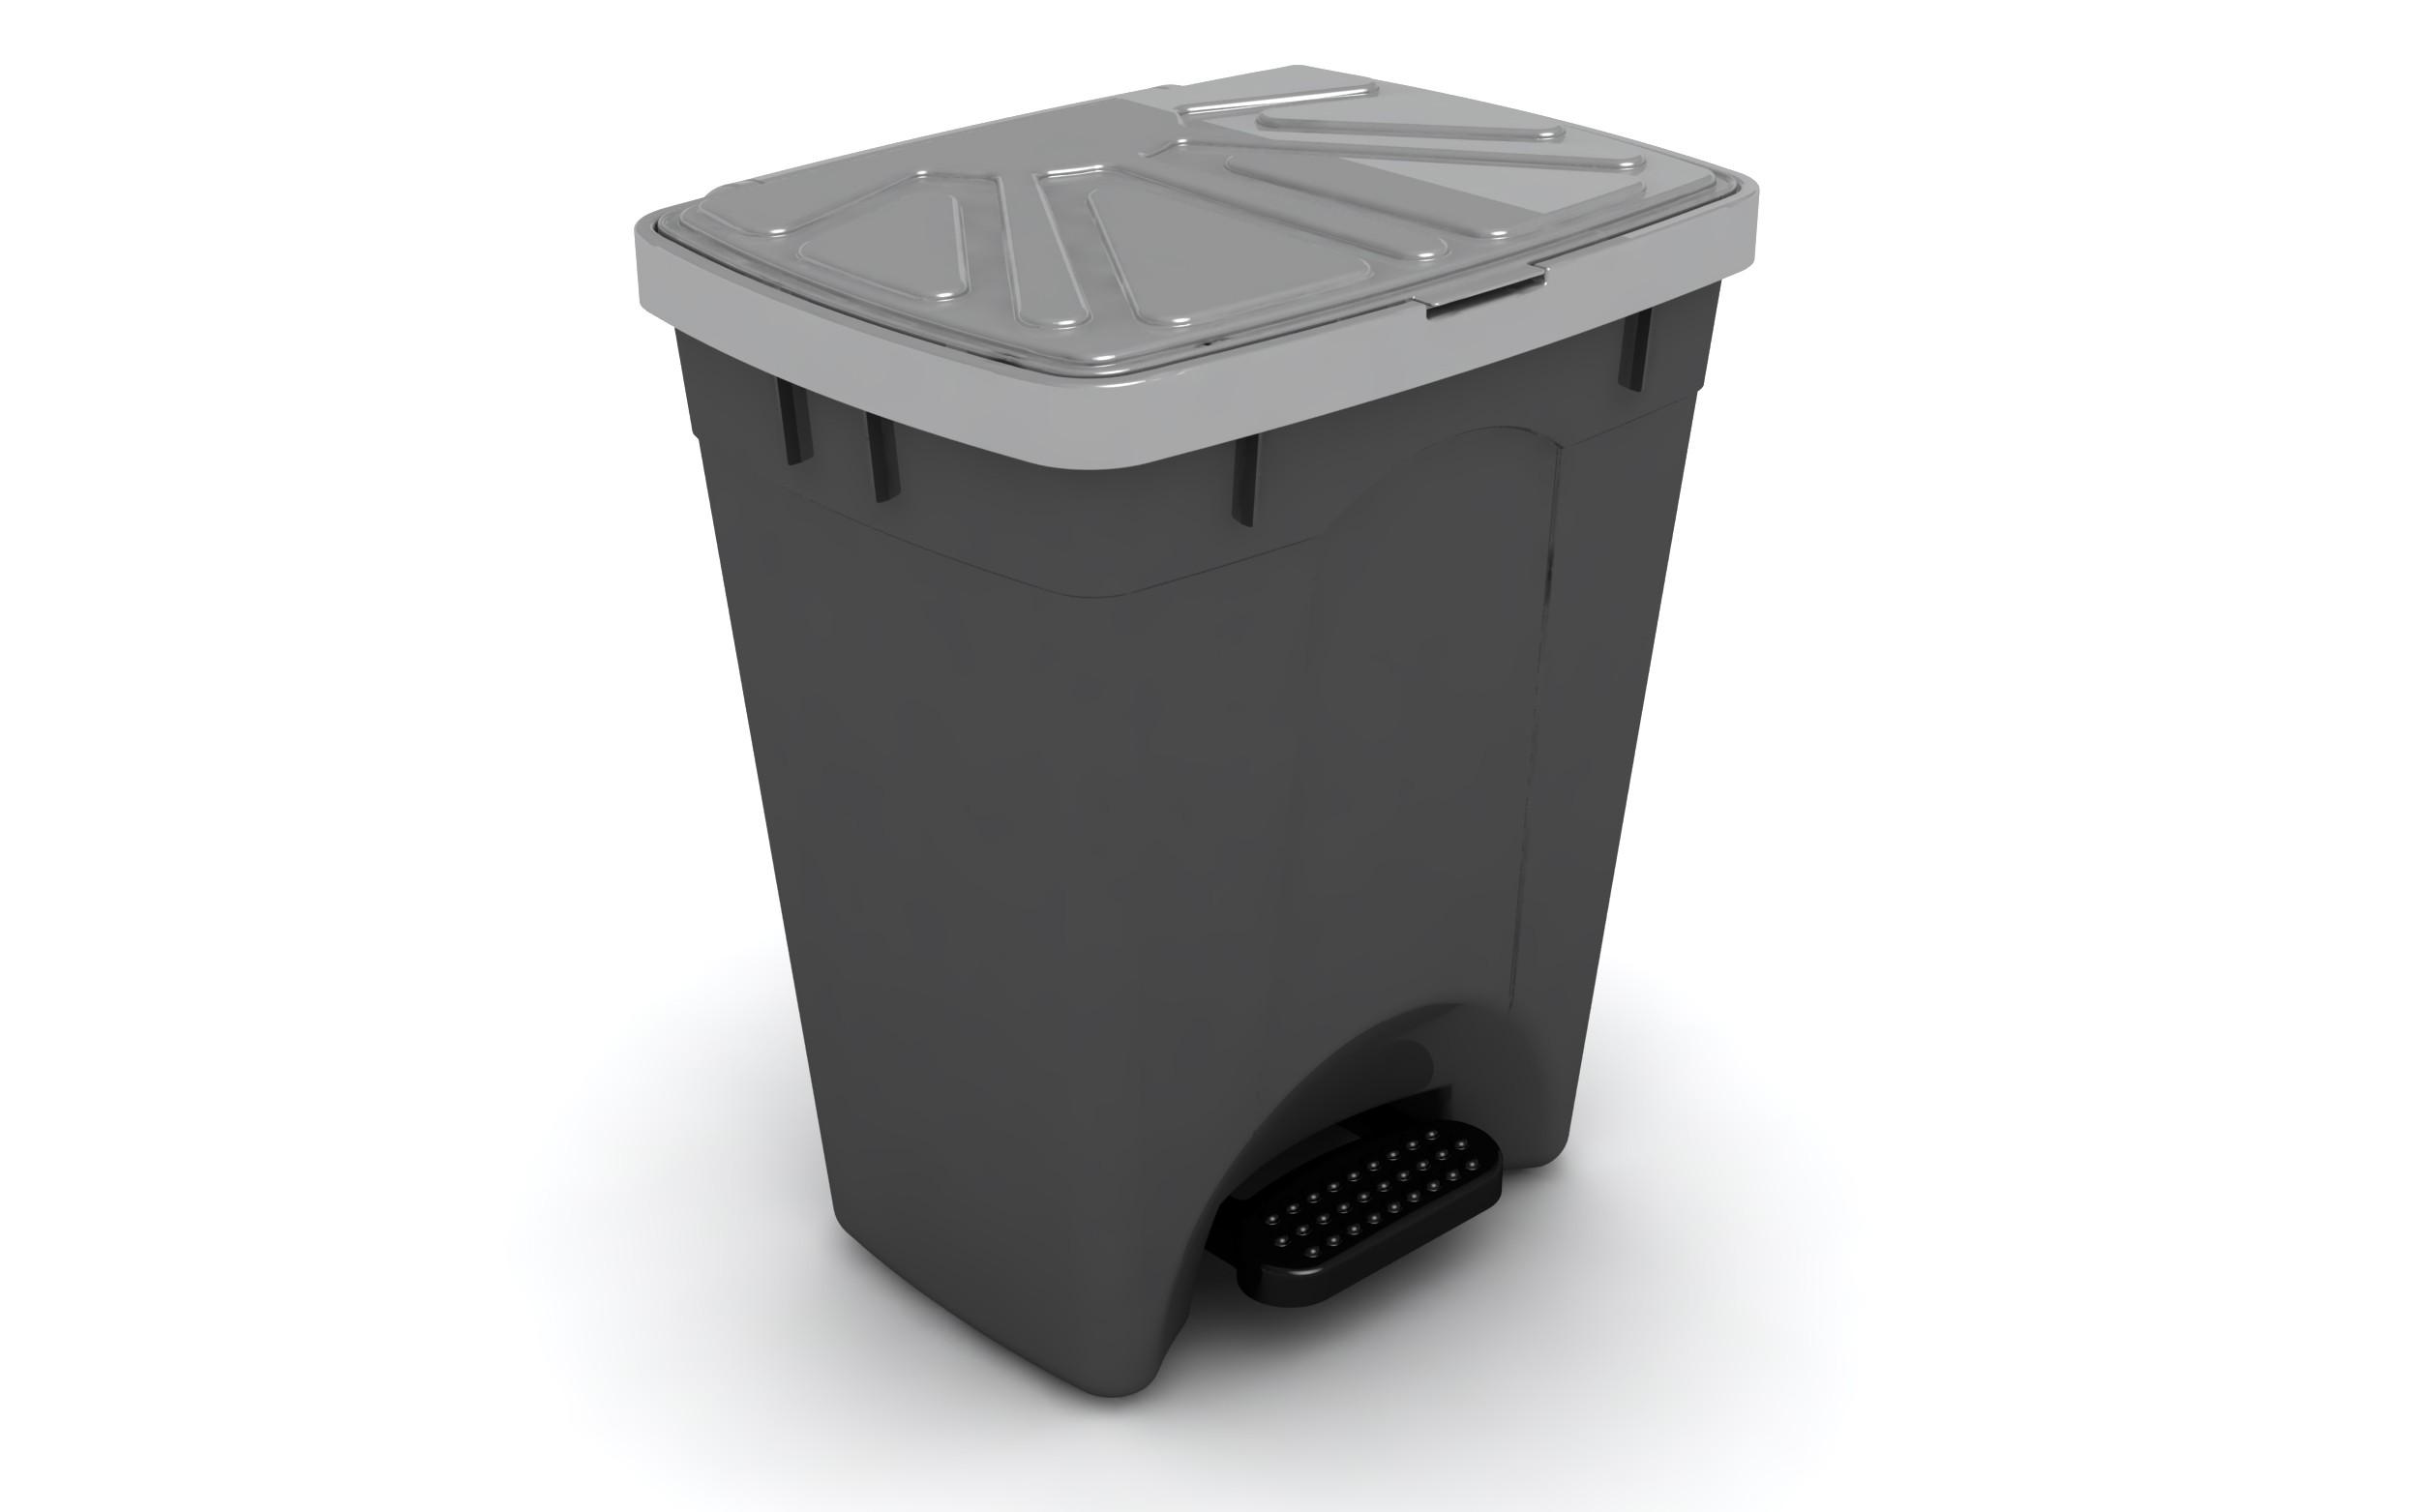 contenedor-26-litros-con-pedal-1